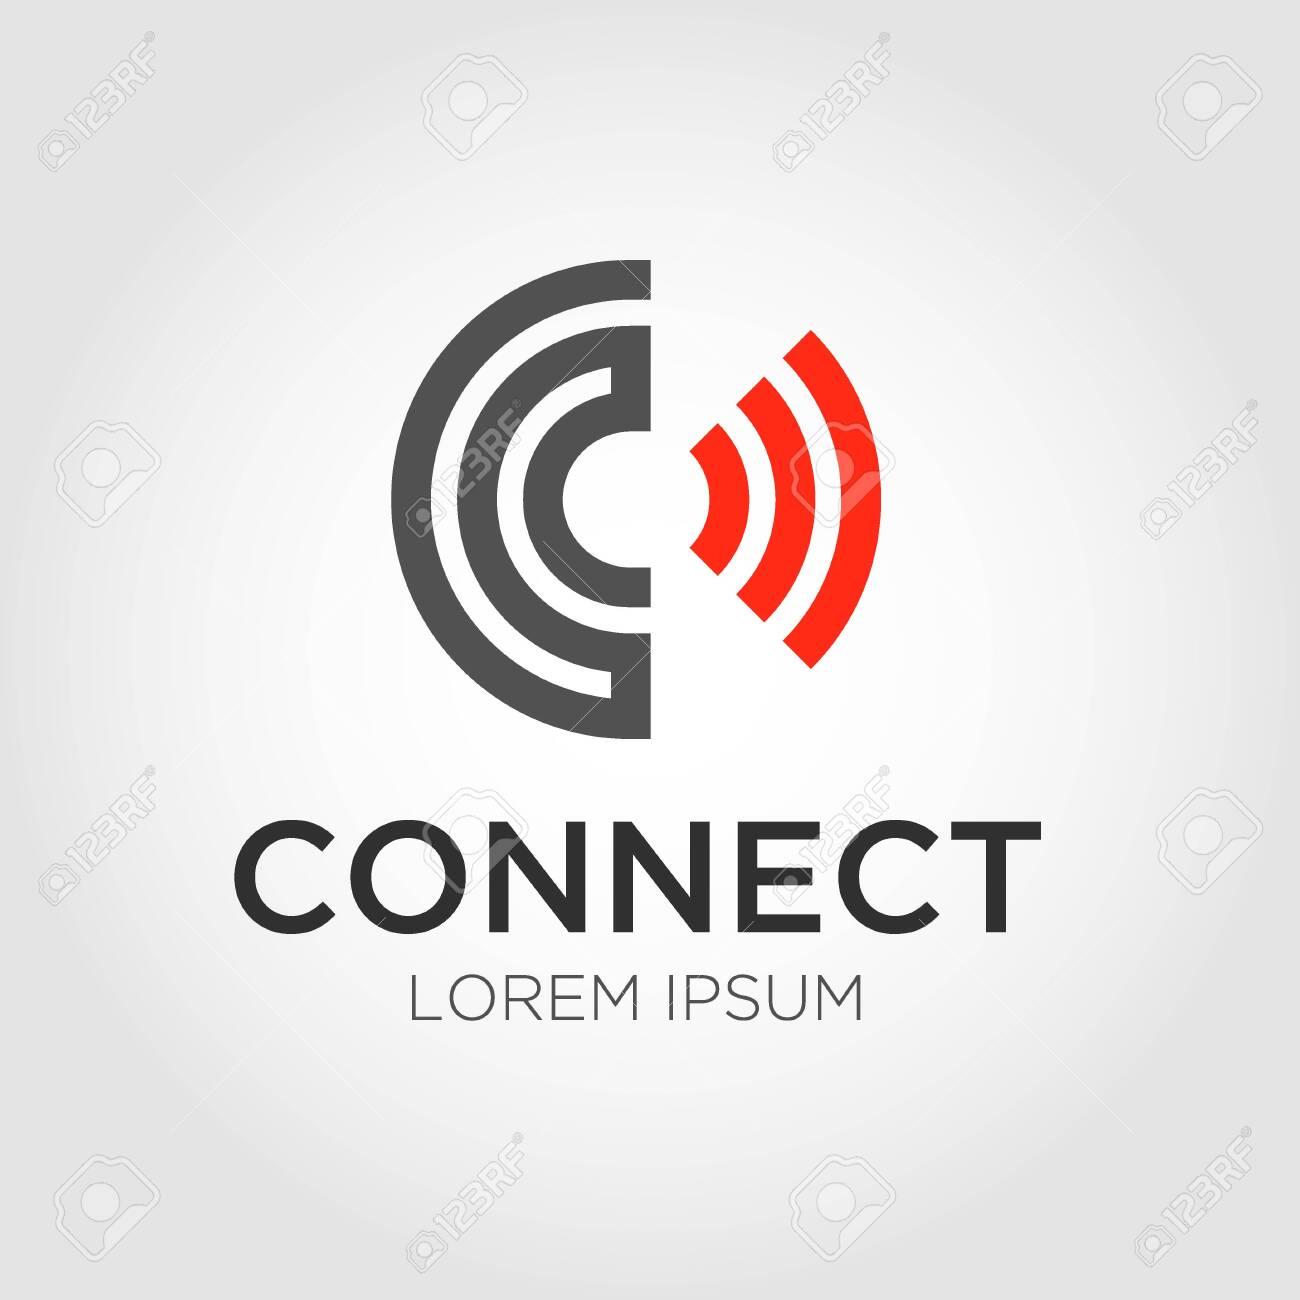 Initial letter logo C, Connect logo design - 126488675